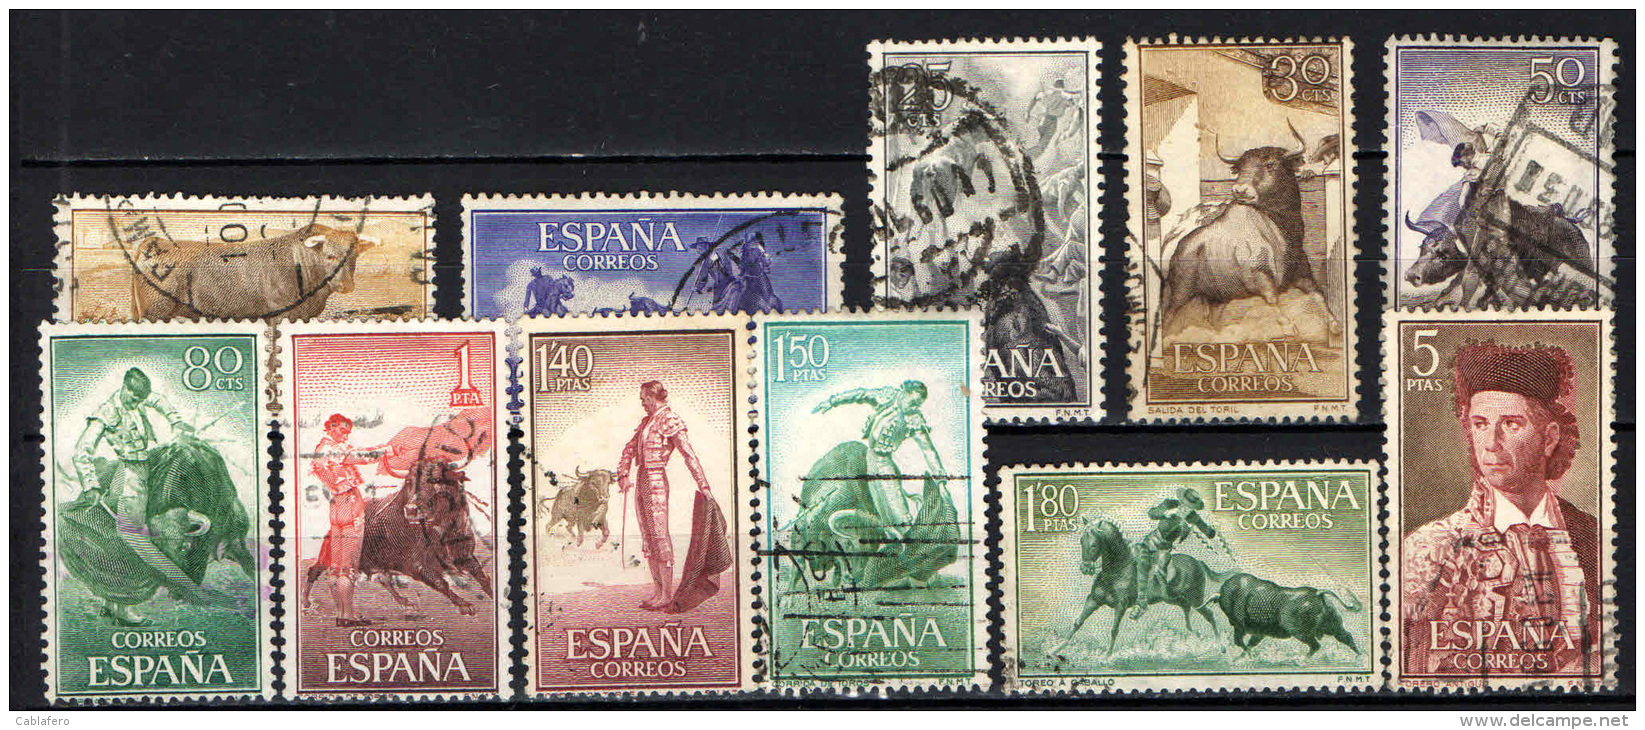 SPAGNA - 1960 - FESTA NAZIONALE - TAUROMACHIA - USATI - 1951-60 Oblitérés